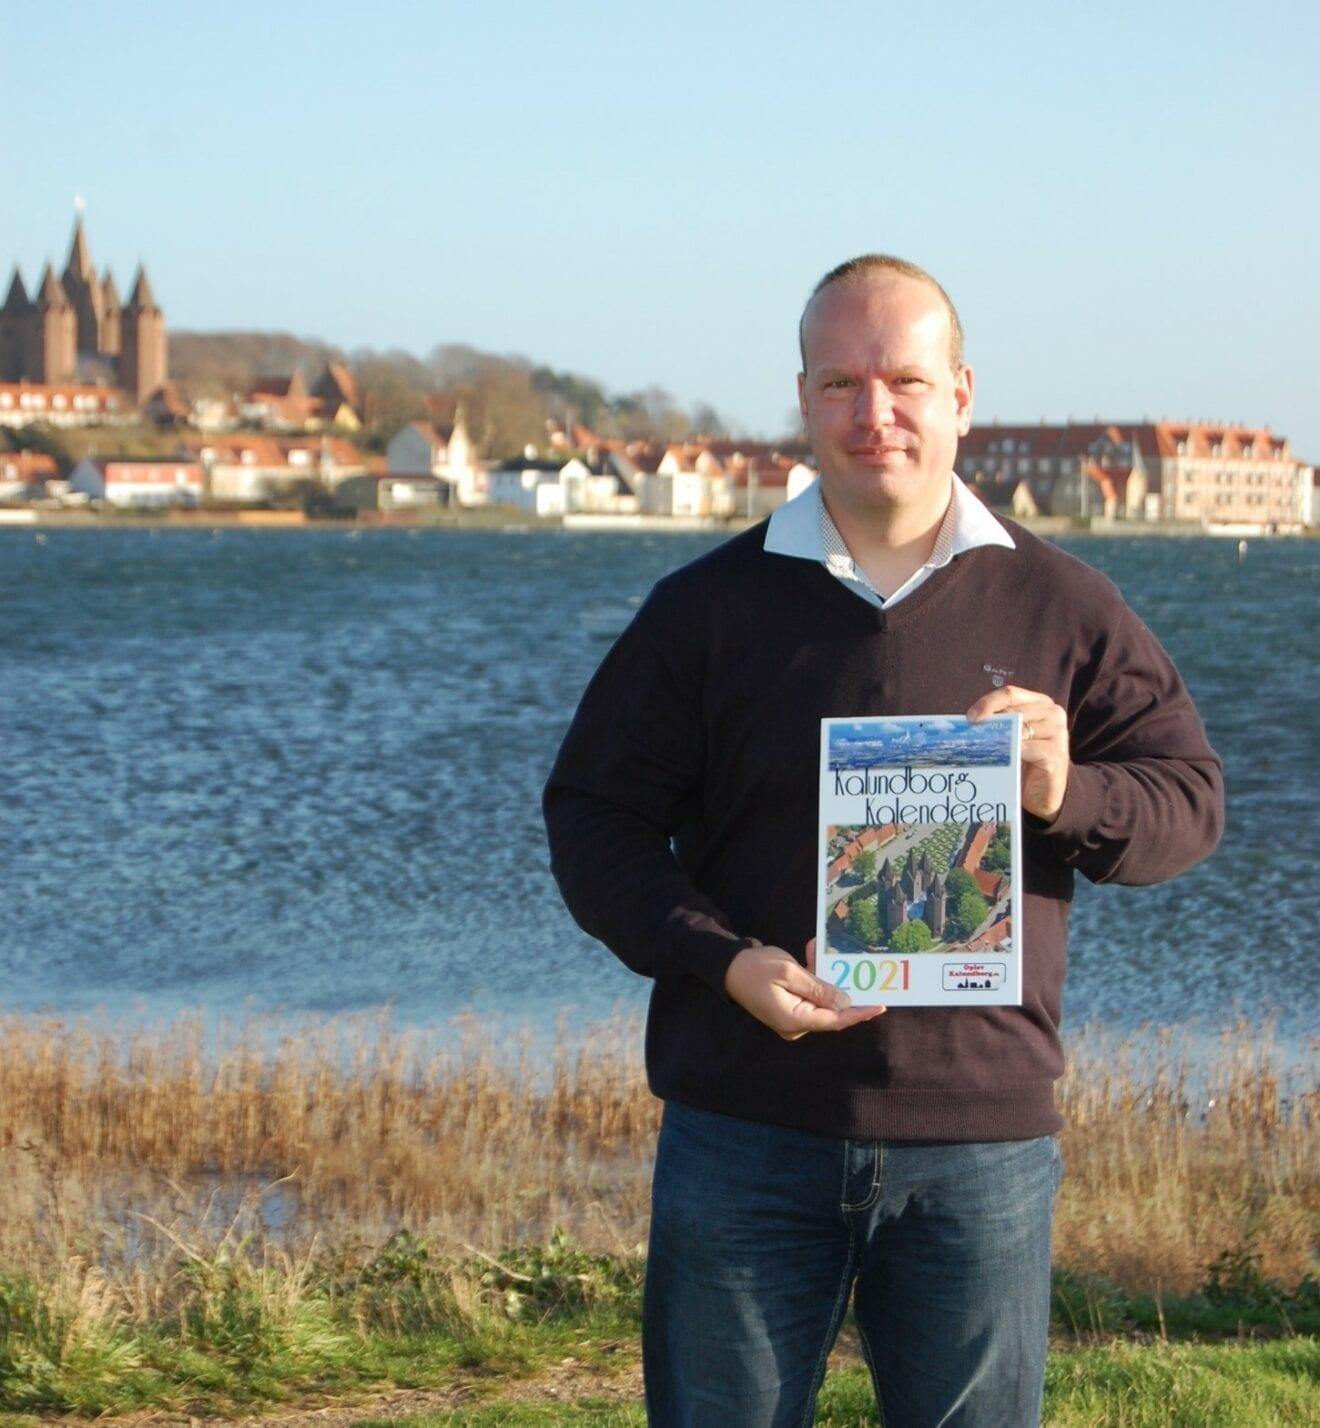 Kalundborg-kalender støtter et godt formål